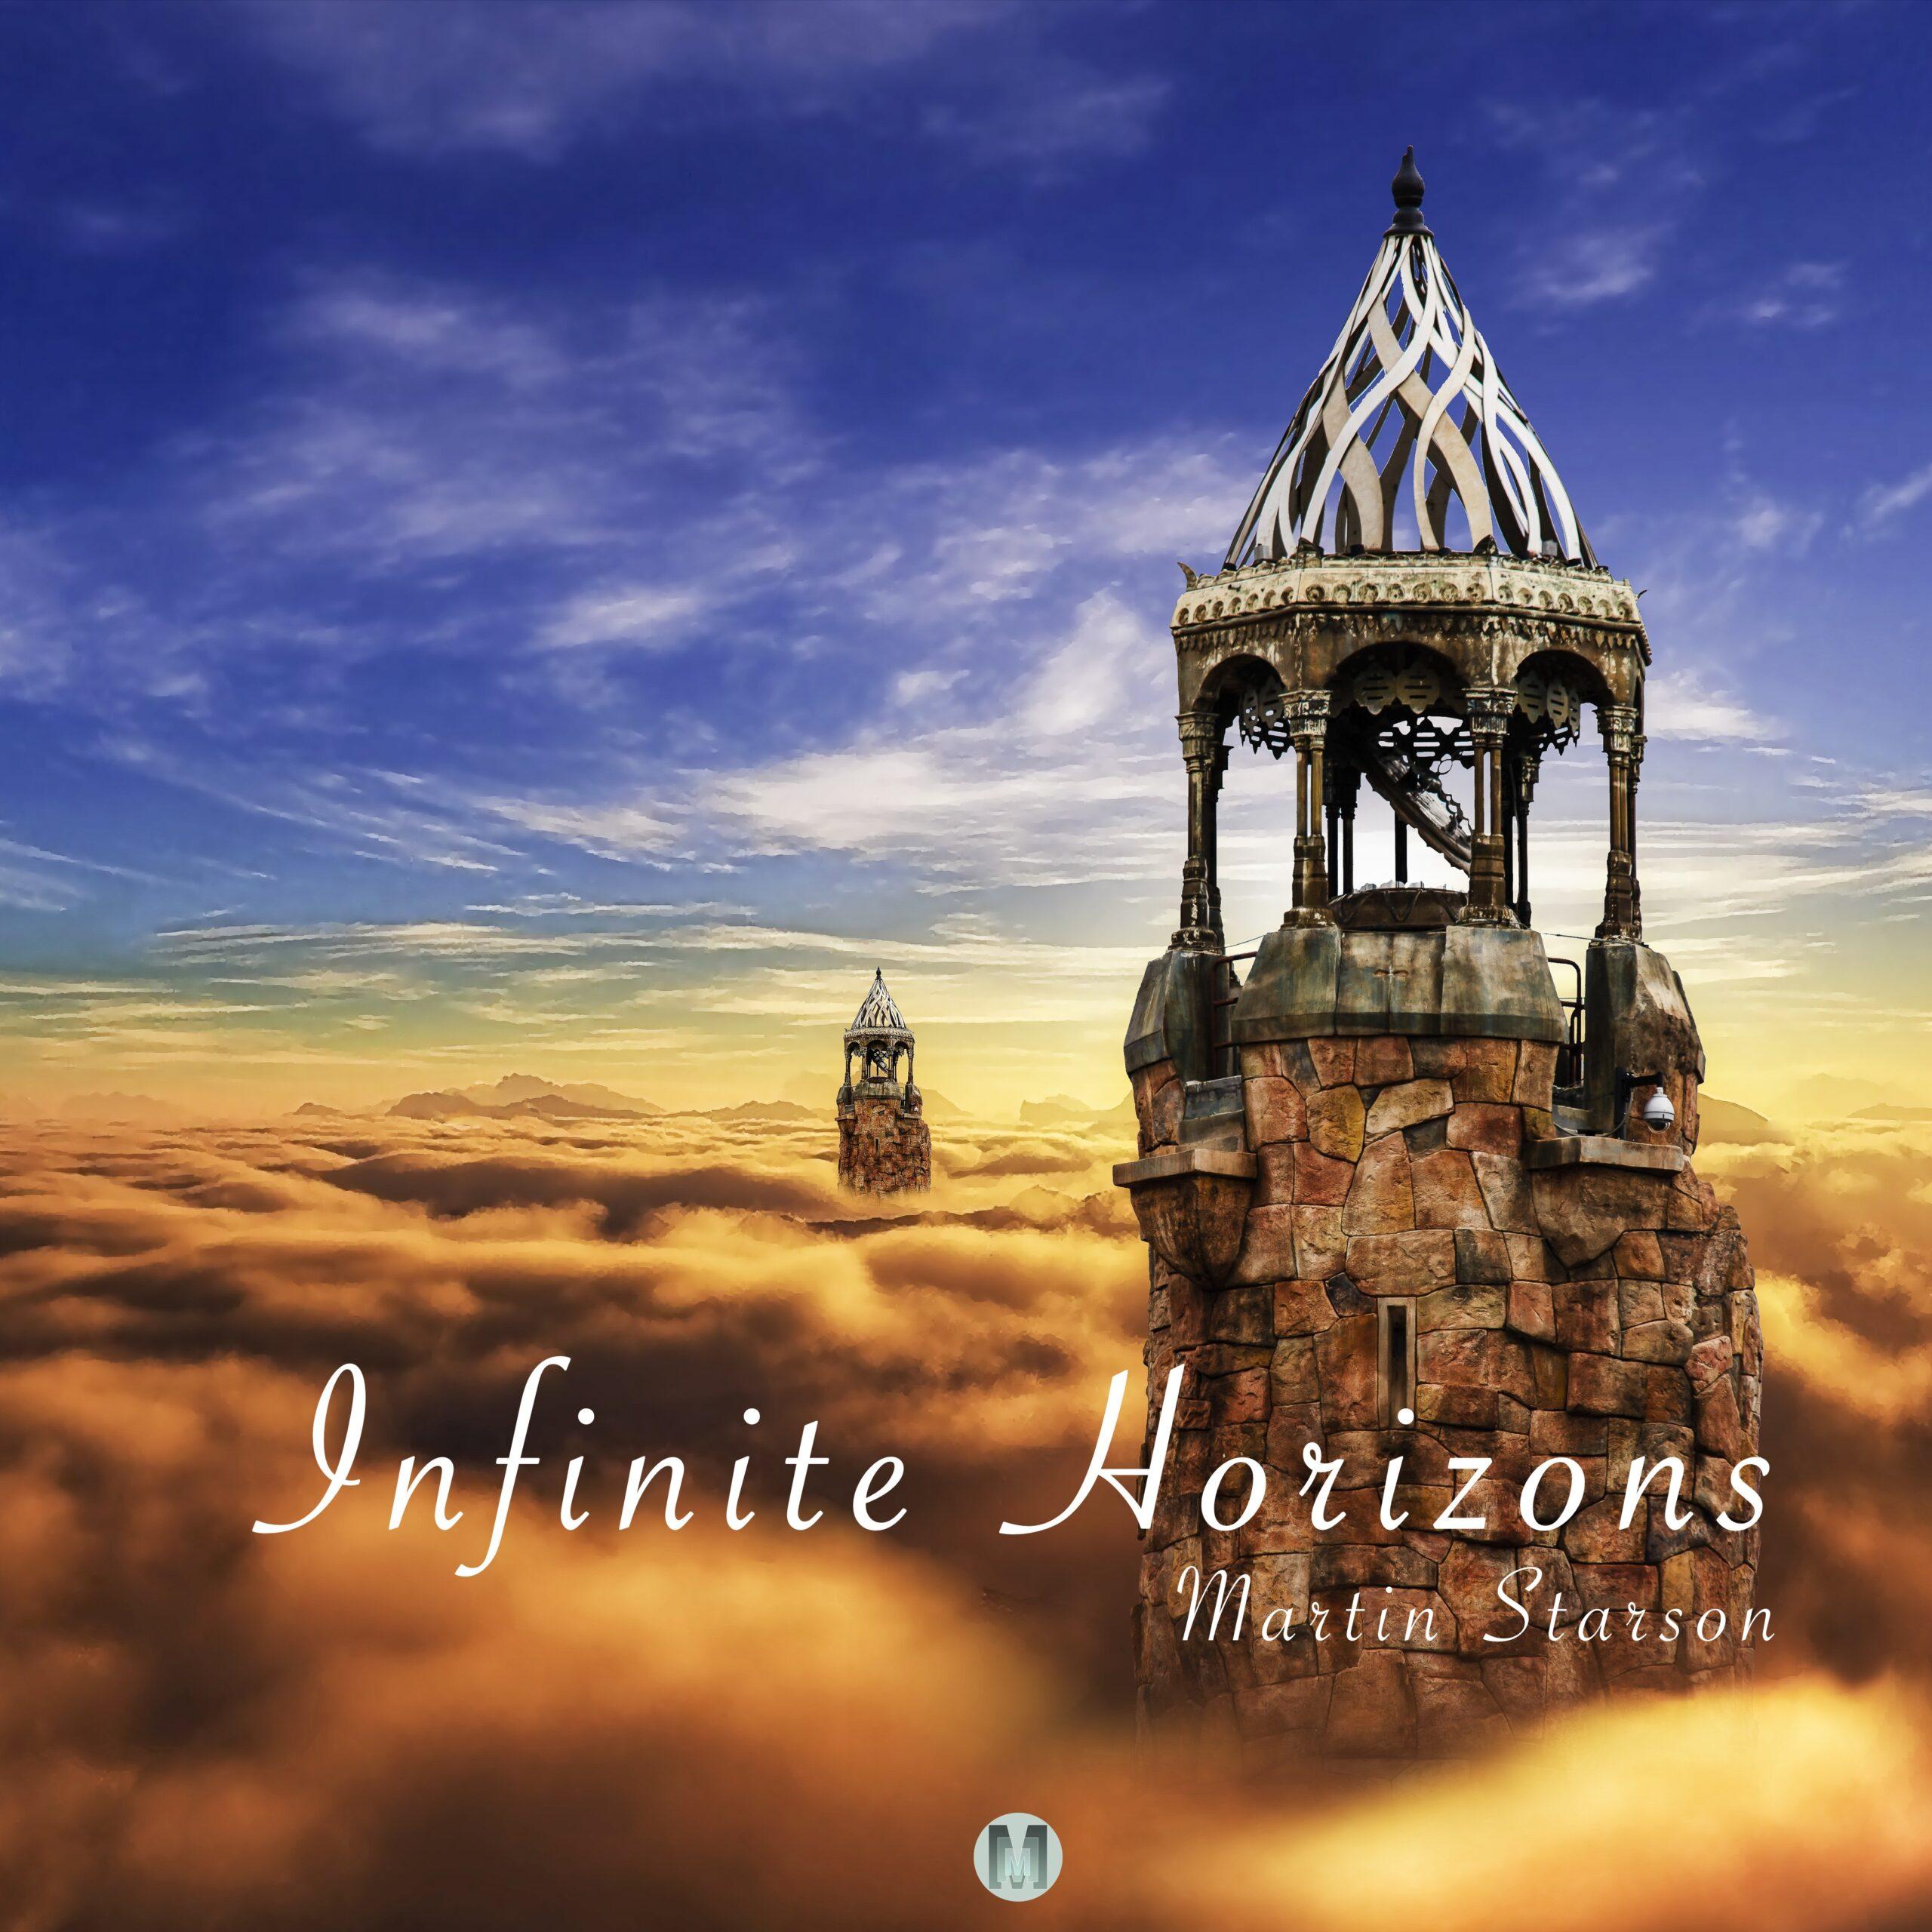 Celtic Fantasy Music 'Infinite Horizons' Harp